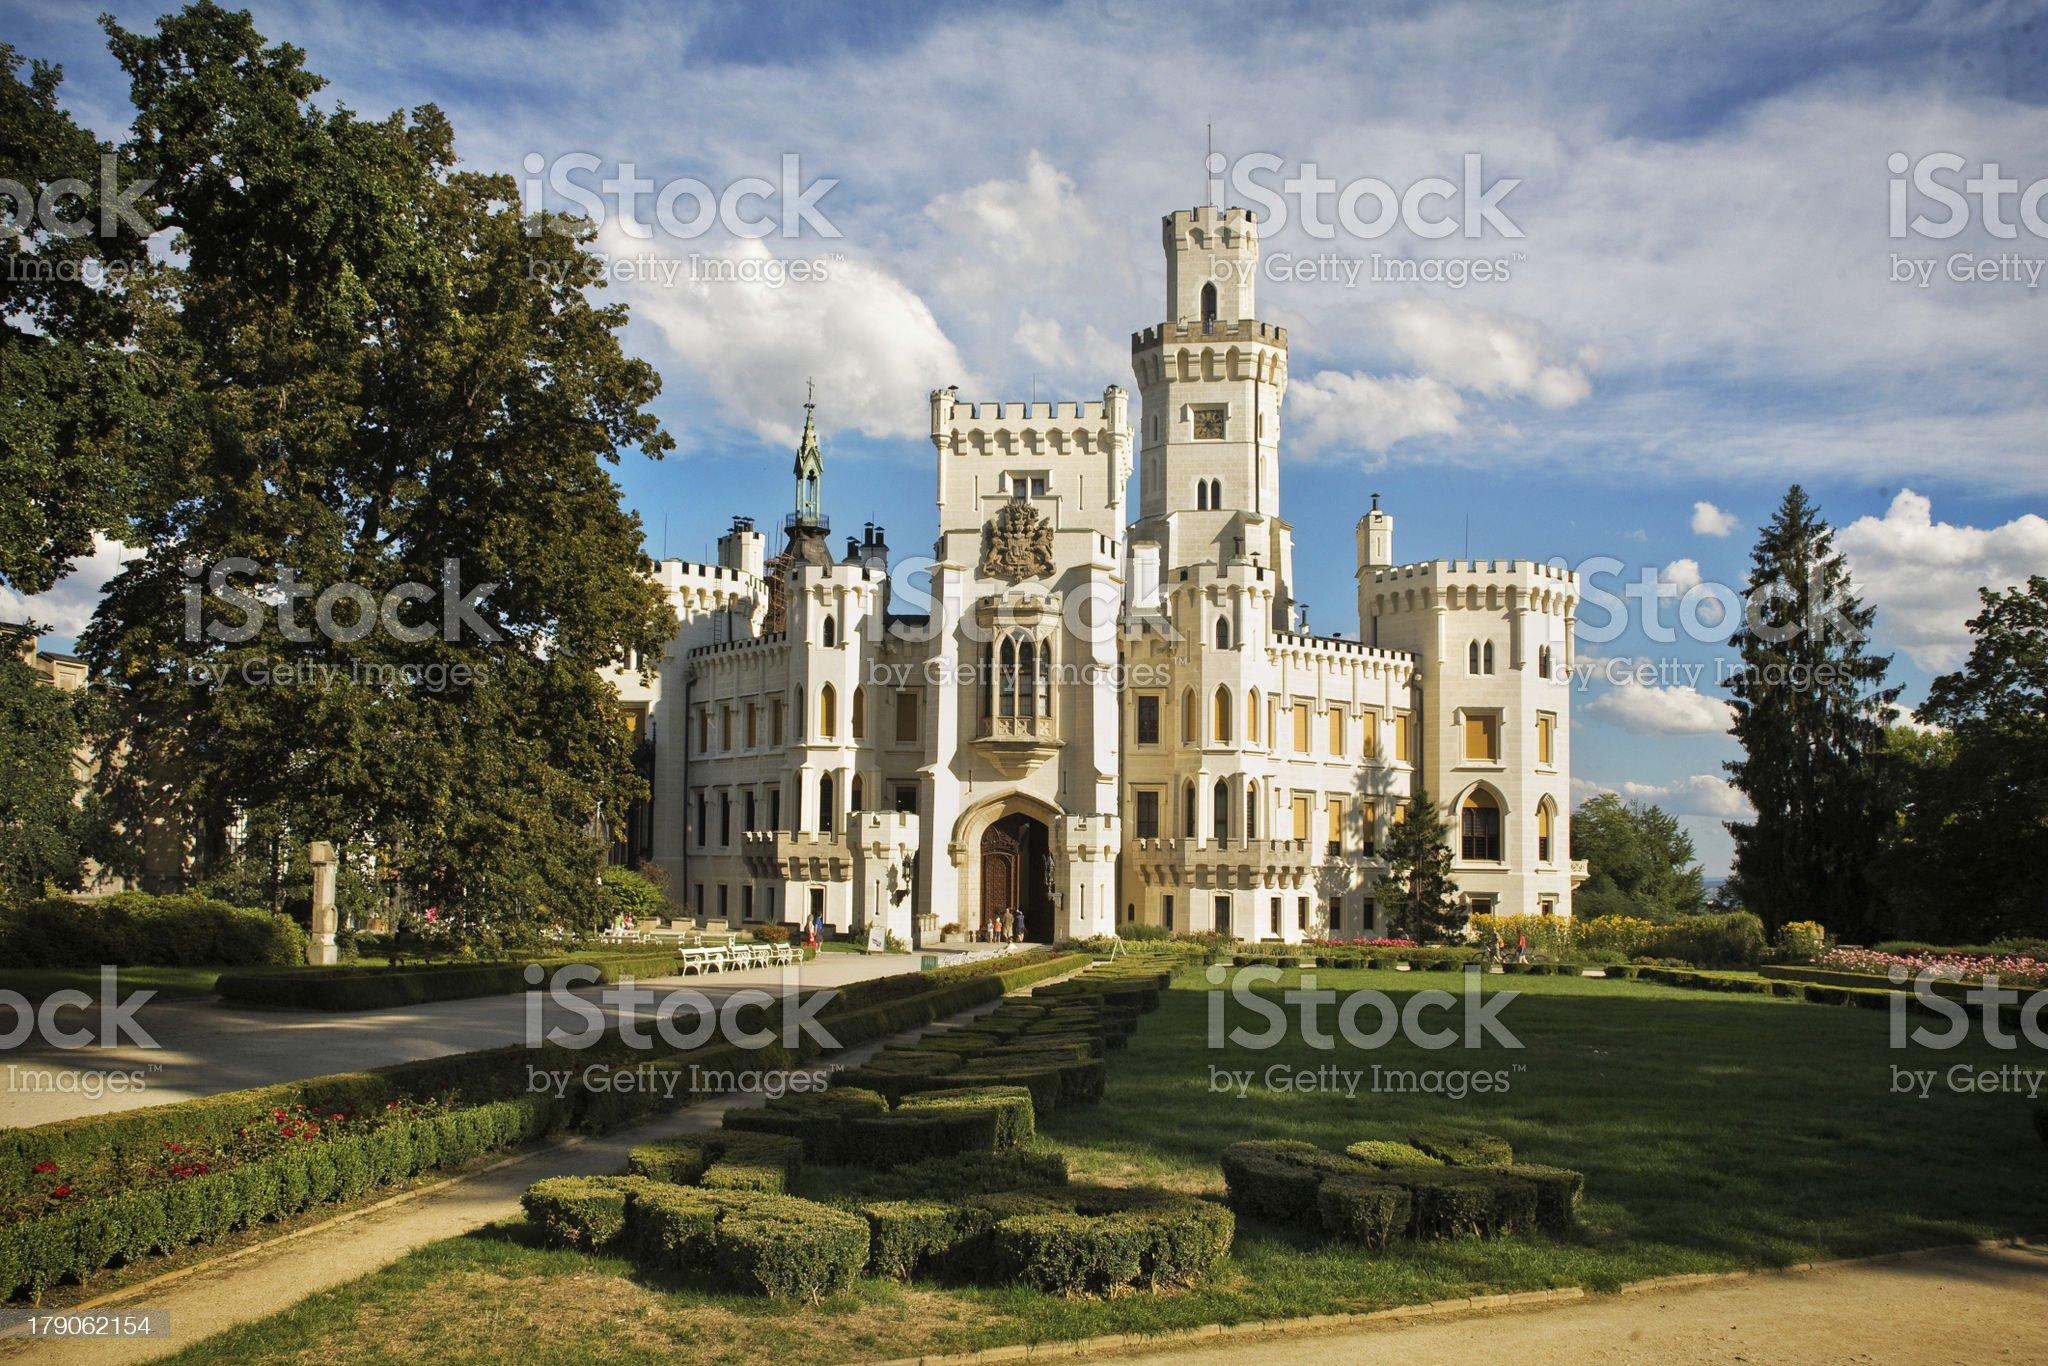 Castle in Hluboka nad Vltavou, Czech Republic royalty-free stock photo